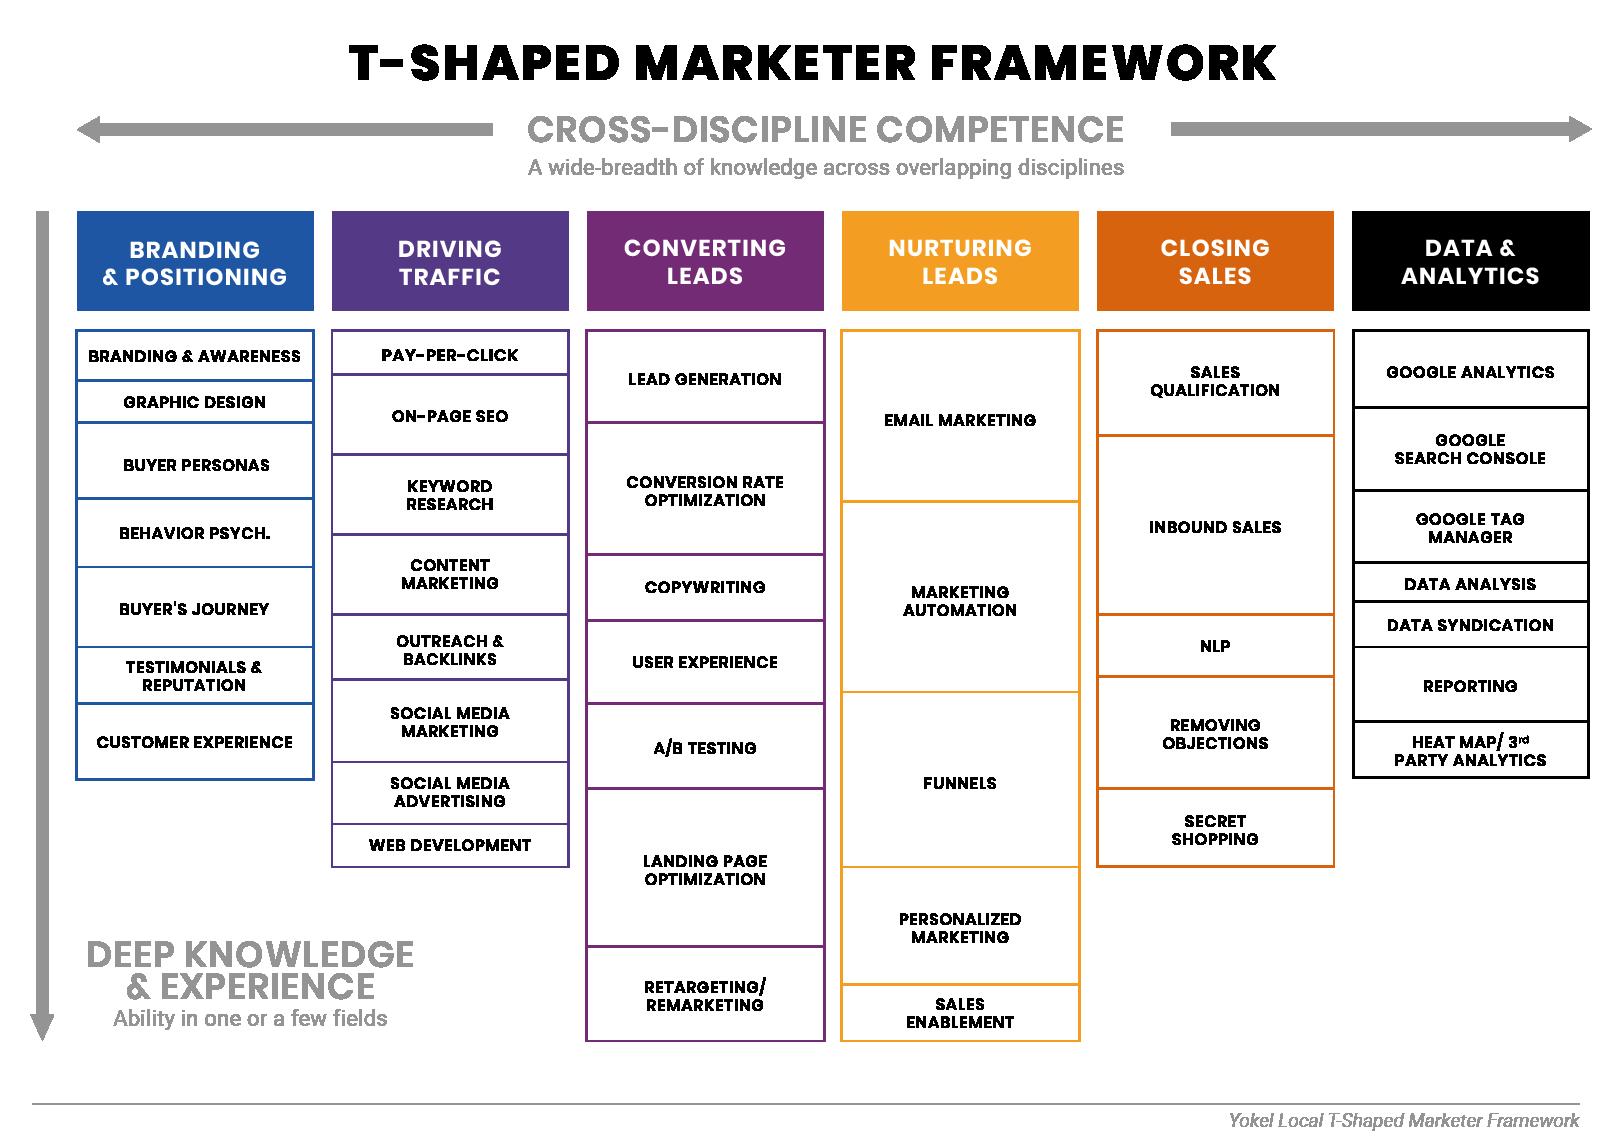 Yokel Local T-Shaped Marketer Framework